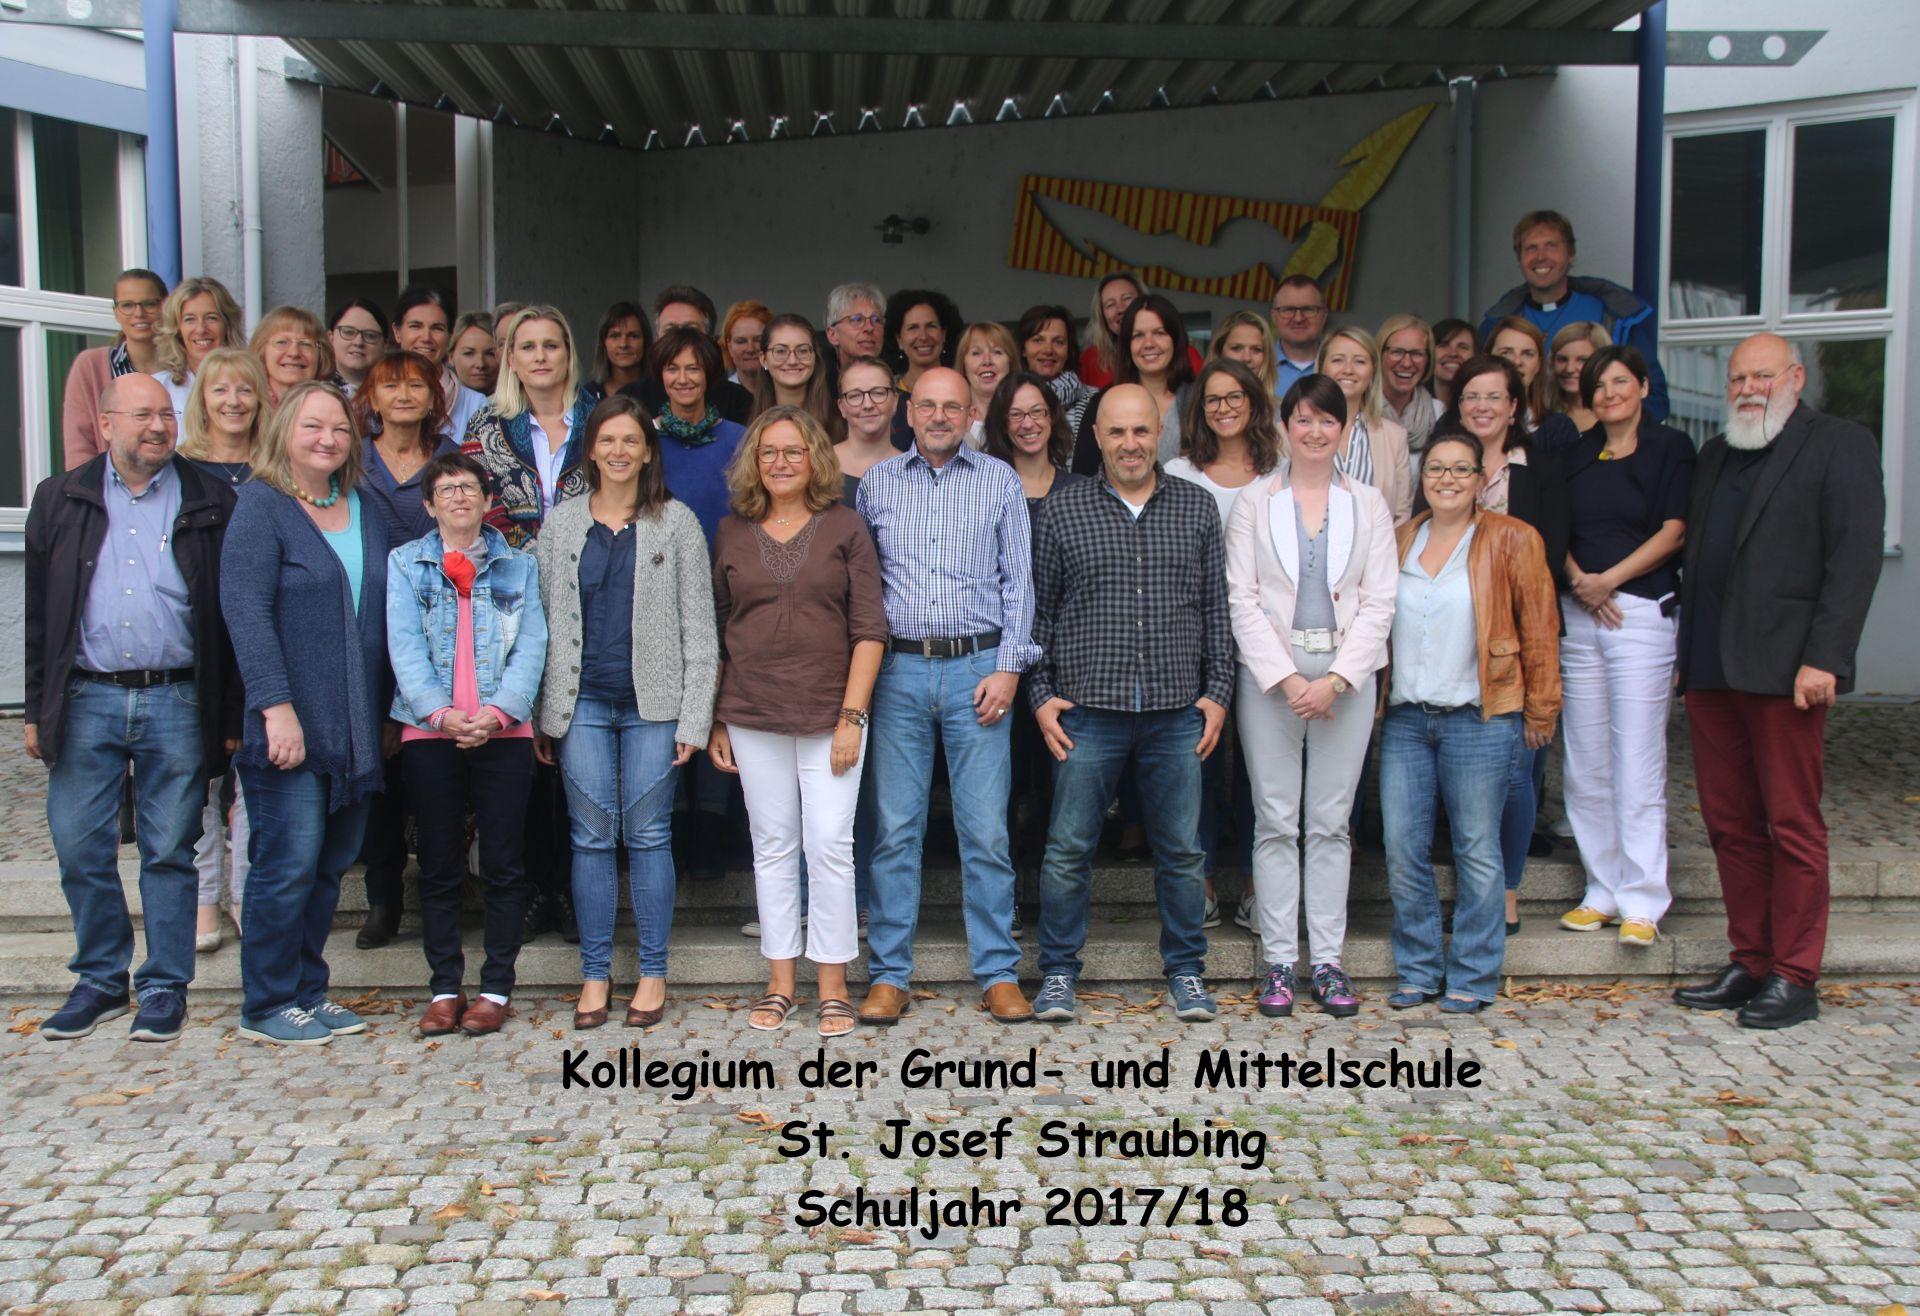 Kollegium 17/18 Straubing